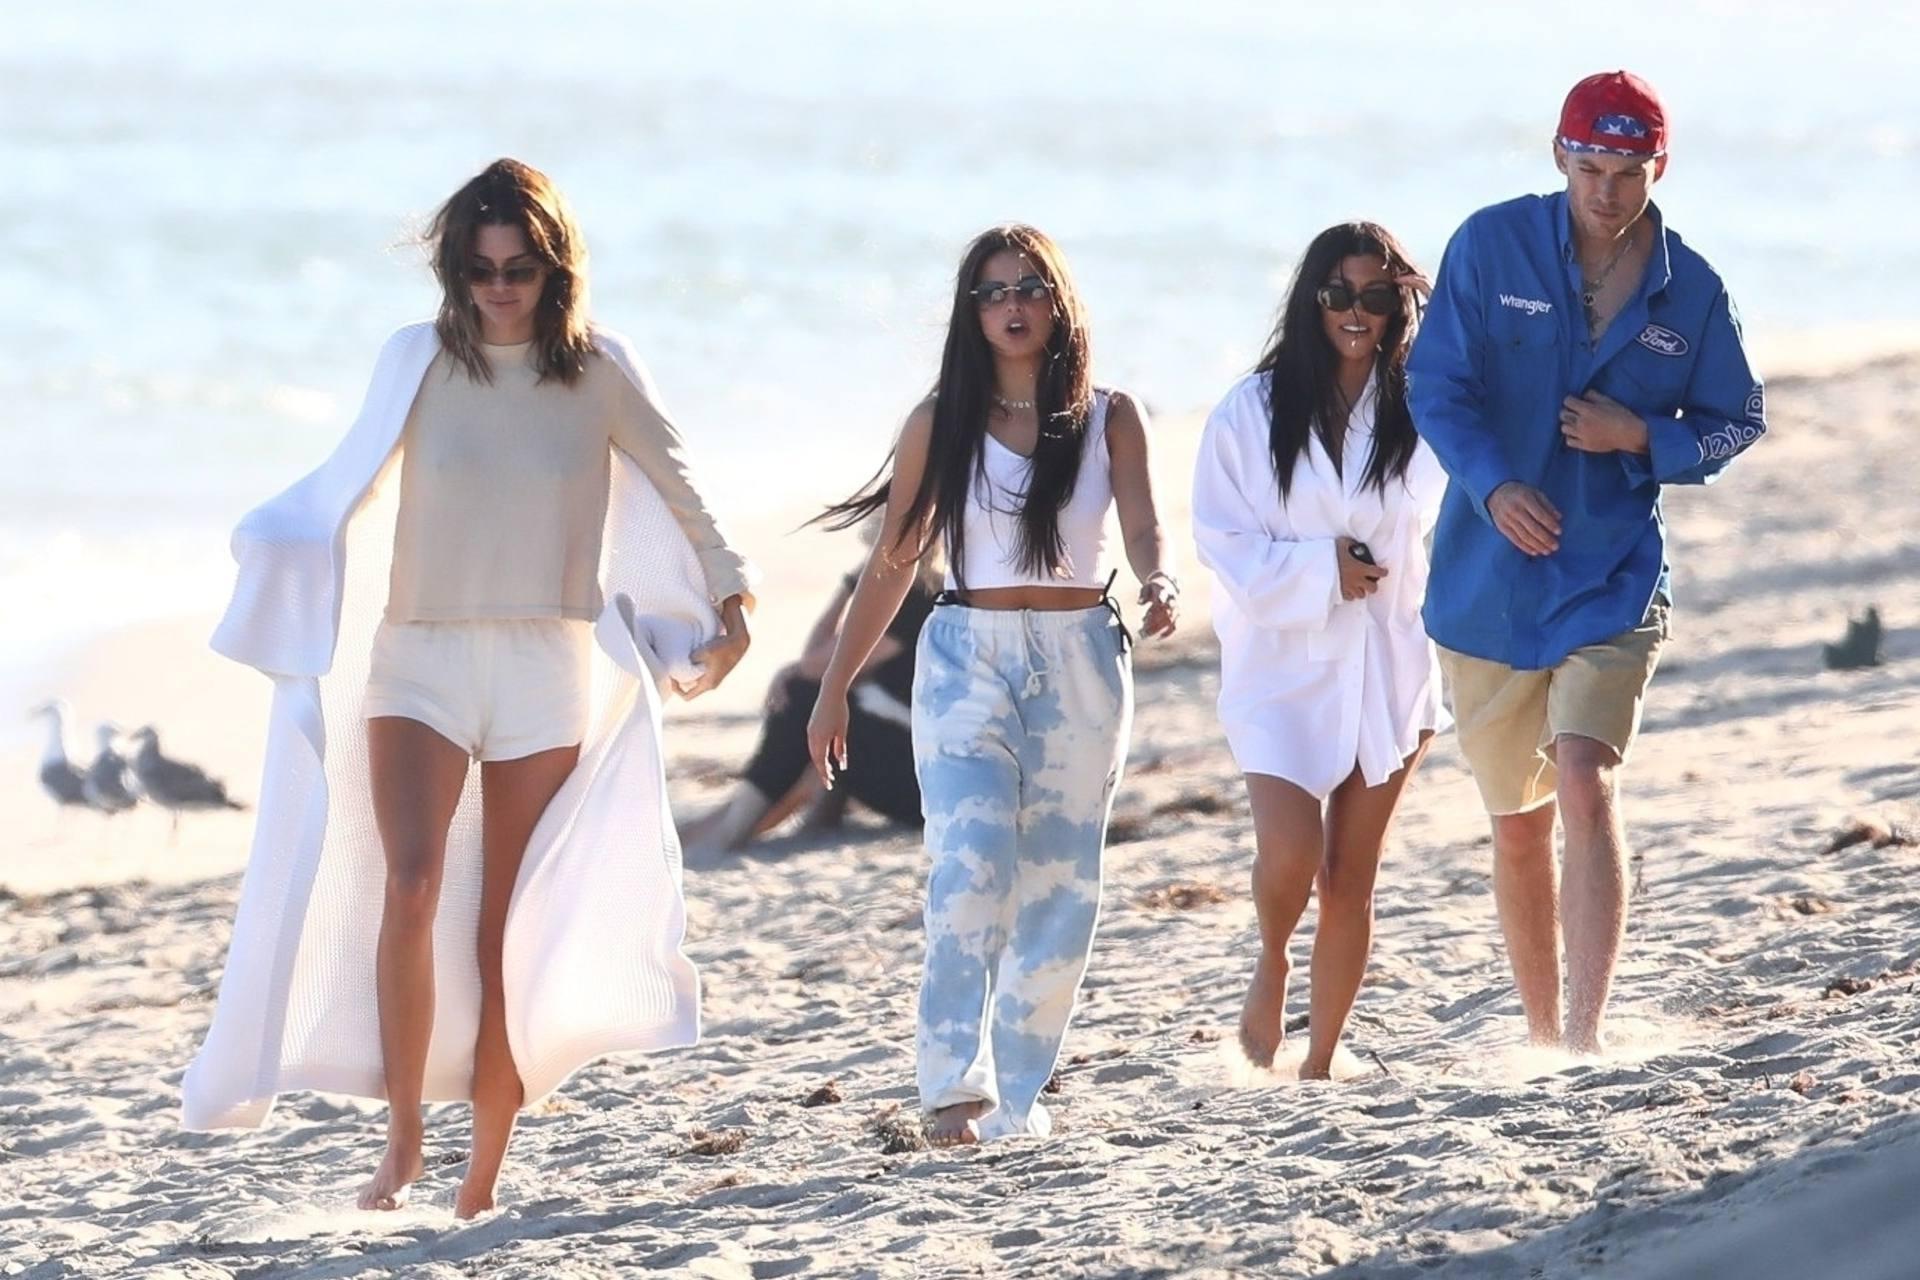 Kourtney Kardashian - Sexy Ass and Big Boobs on the Beach